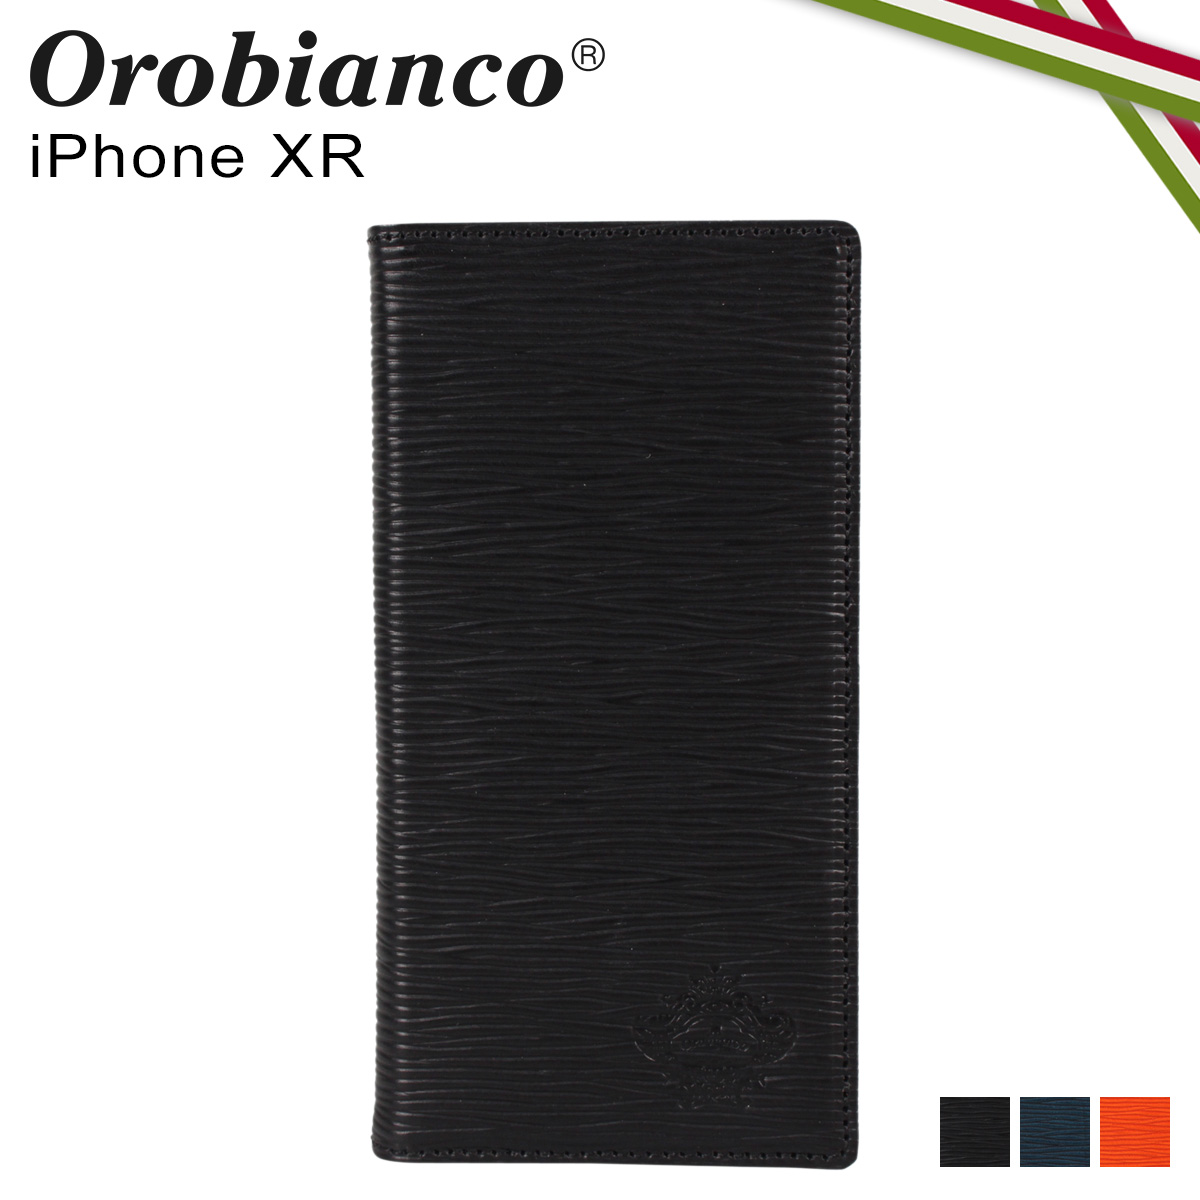 Orobianco オロビアンコ iPhoneXR ケース スマホ 携帯 手帳型 アイフォン メンズ レディース ONDA BOOK TYPE SMARTPHONE CASE ブラック ネイビー オレンジ 黒 ORIP-0006XR